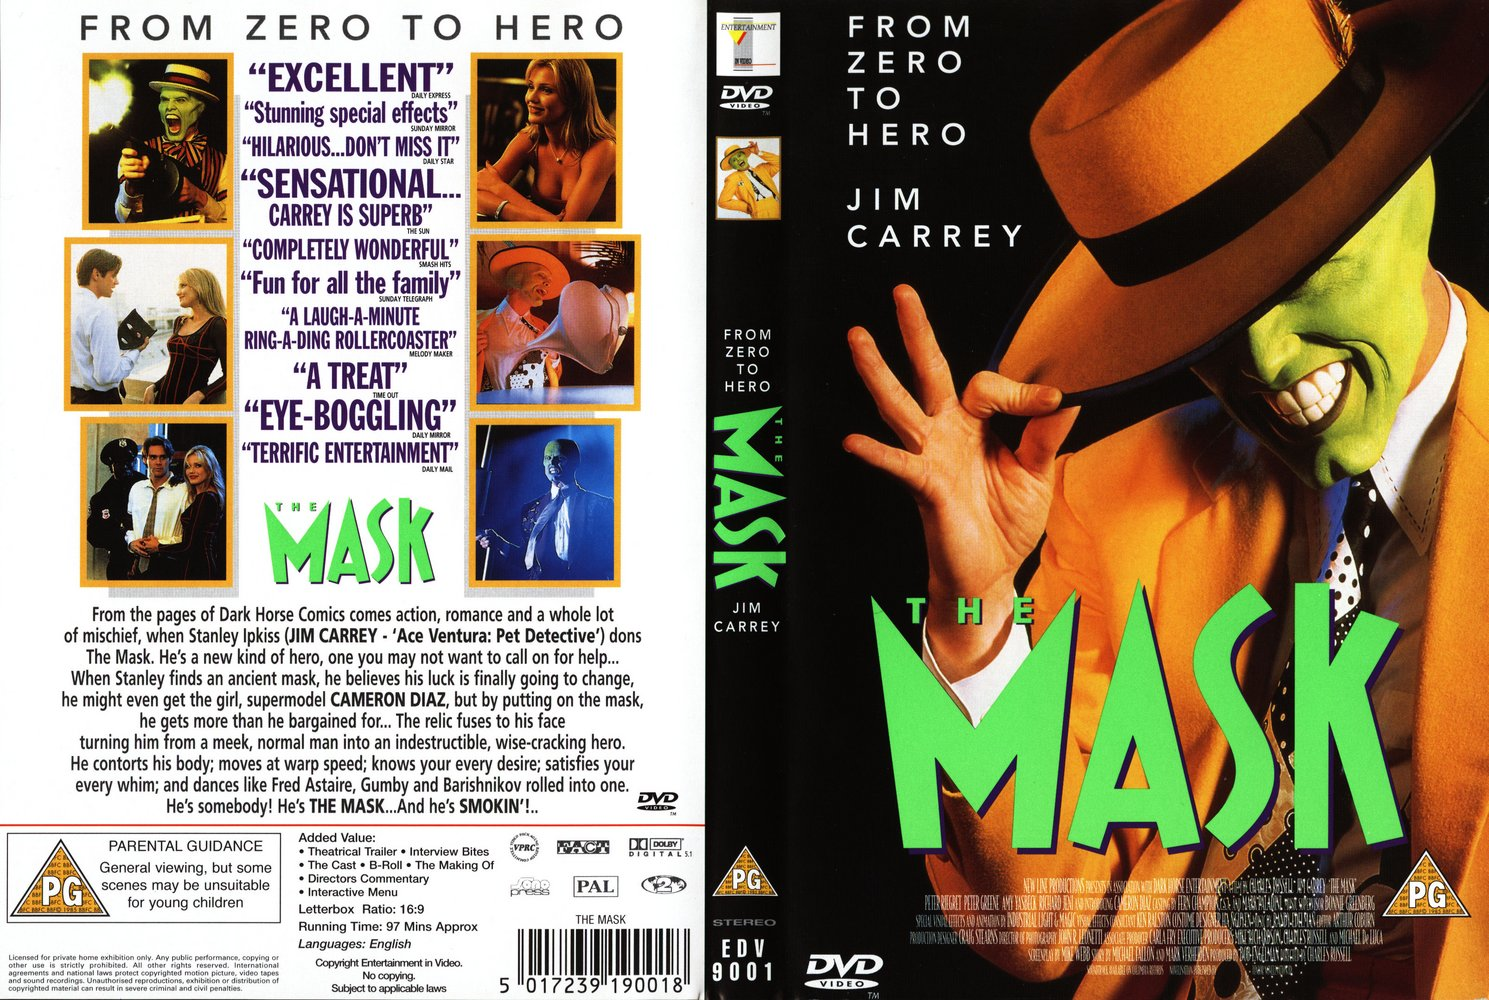 Mask 1994 subtitles: dallas cowboys record 2007 season.